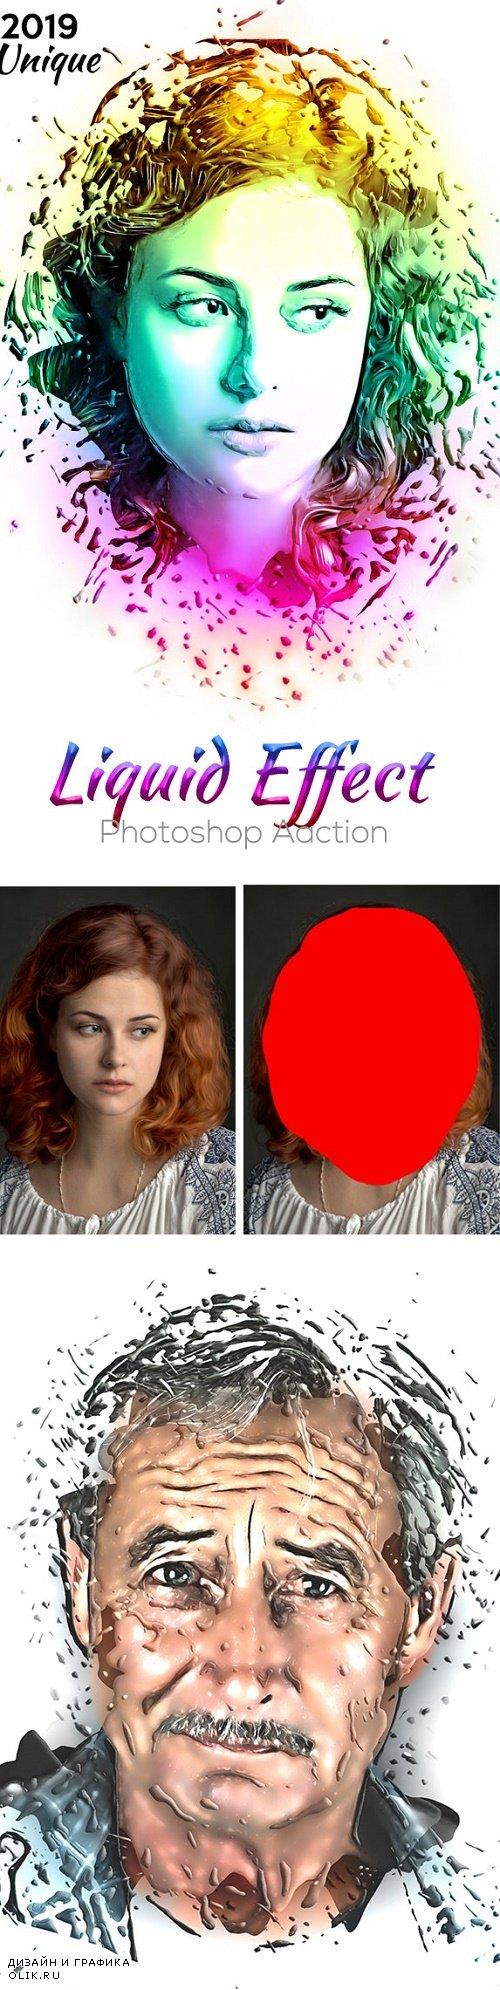 Liquid Effect Photoshop Action 24420163